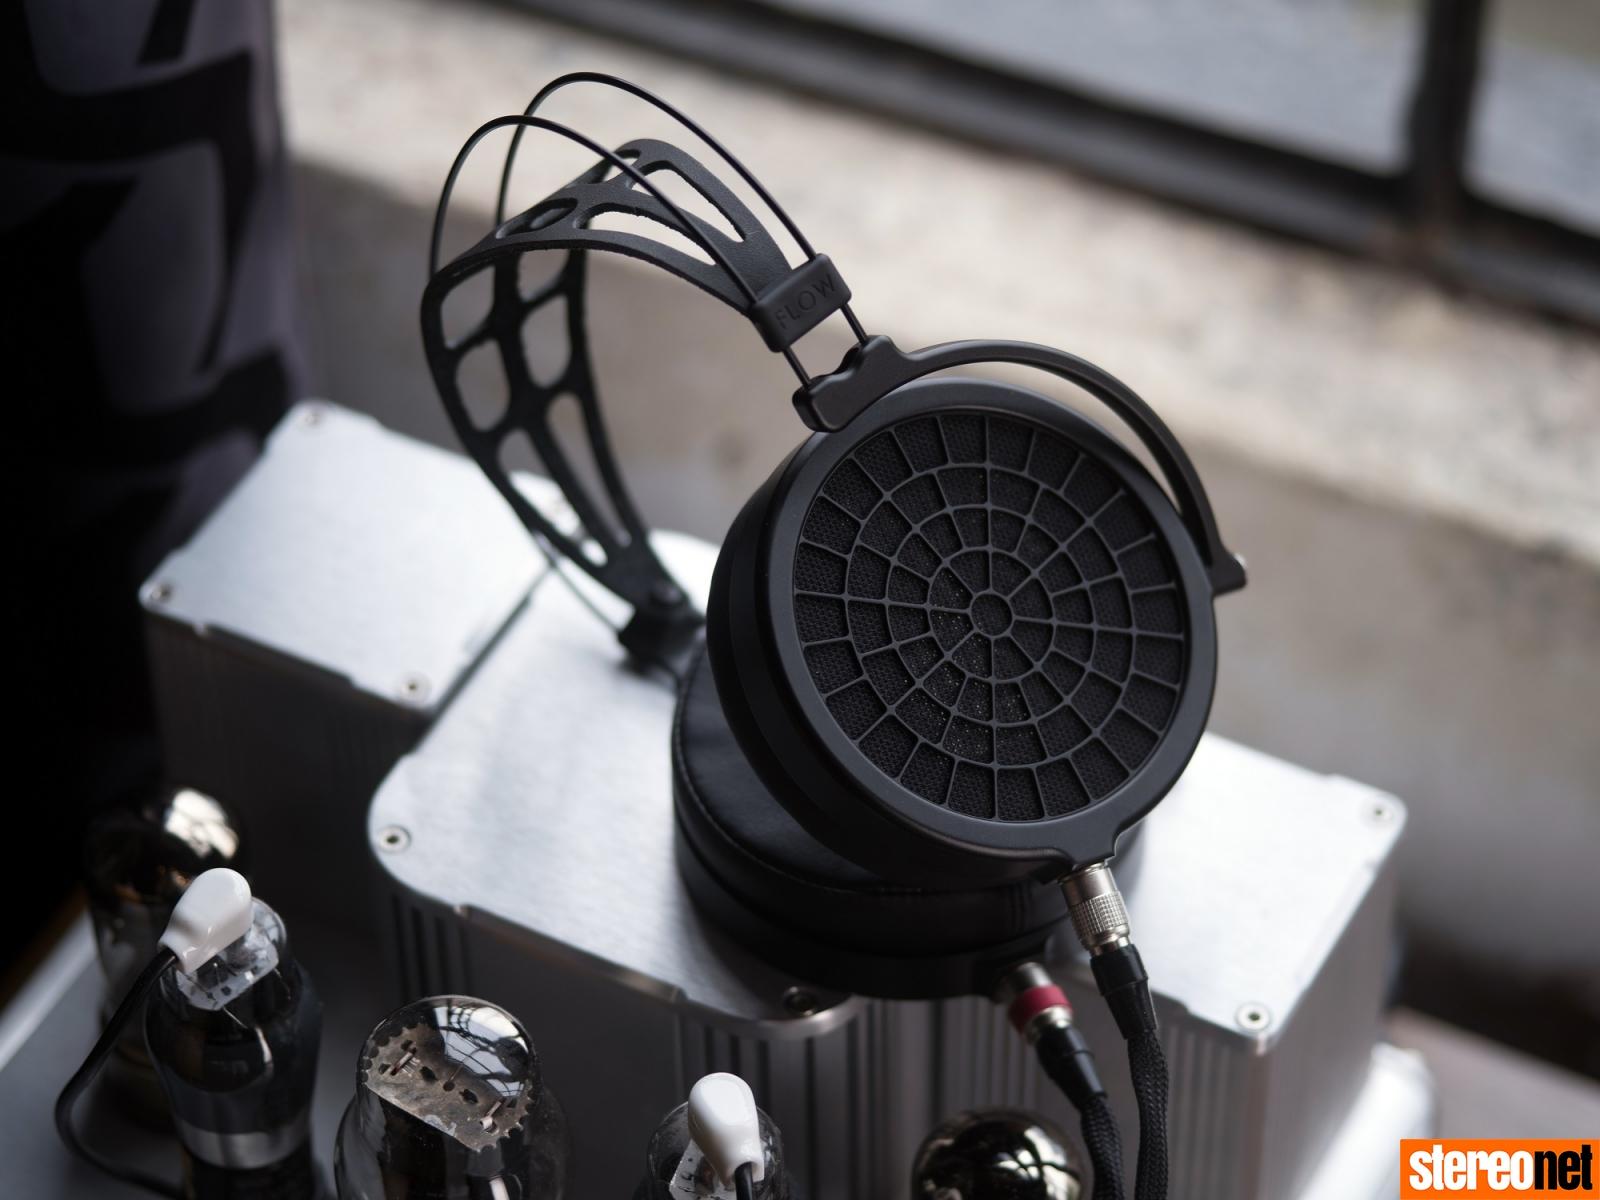 Dan Clak Audio Ether 2 System